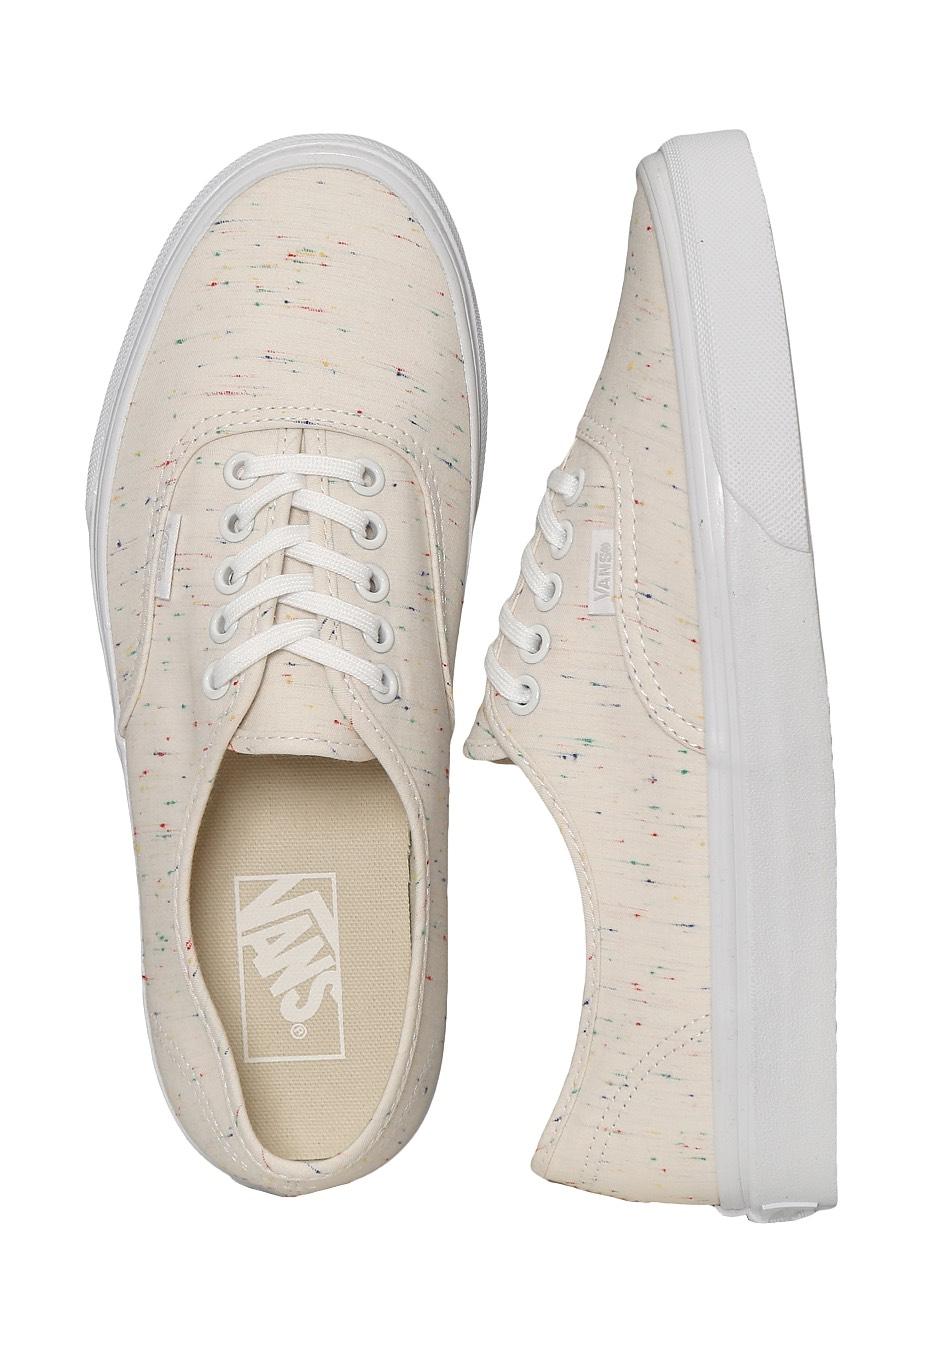 7feb47126397c1 Vans - Authentic Speckle Jersey Cream True White - Girl Shoes - Impericon.com  UK